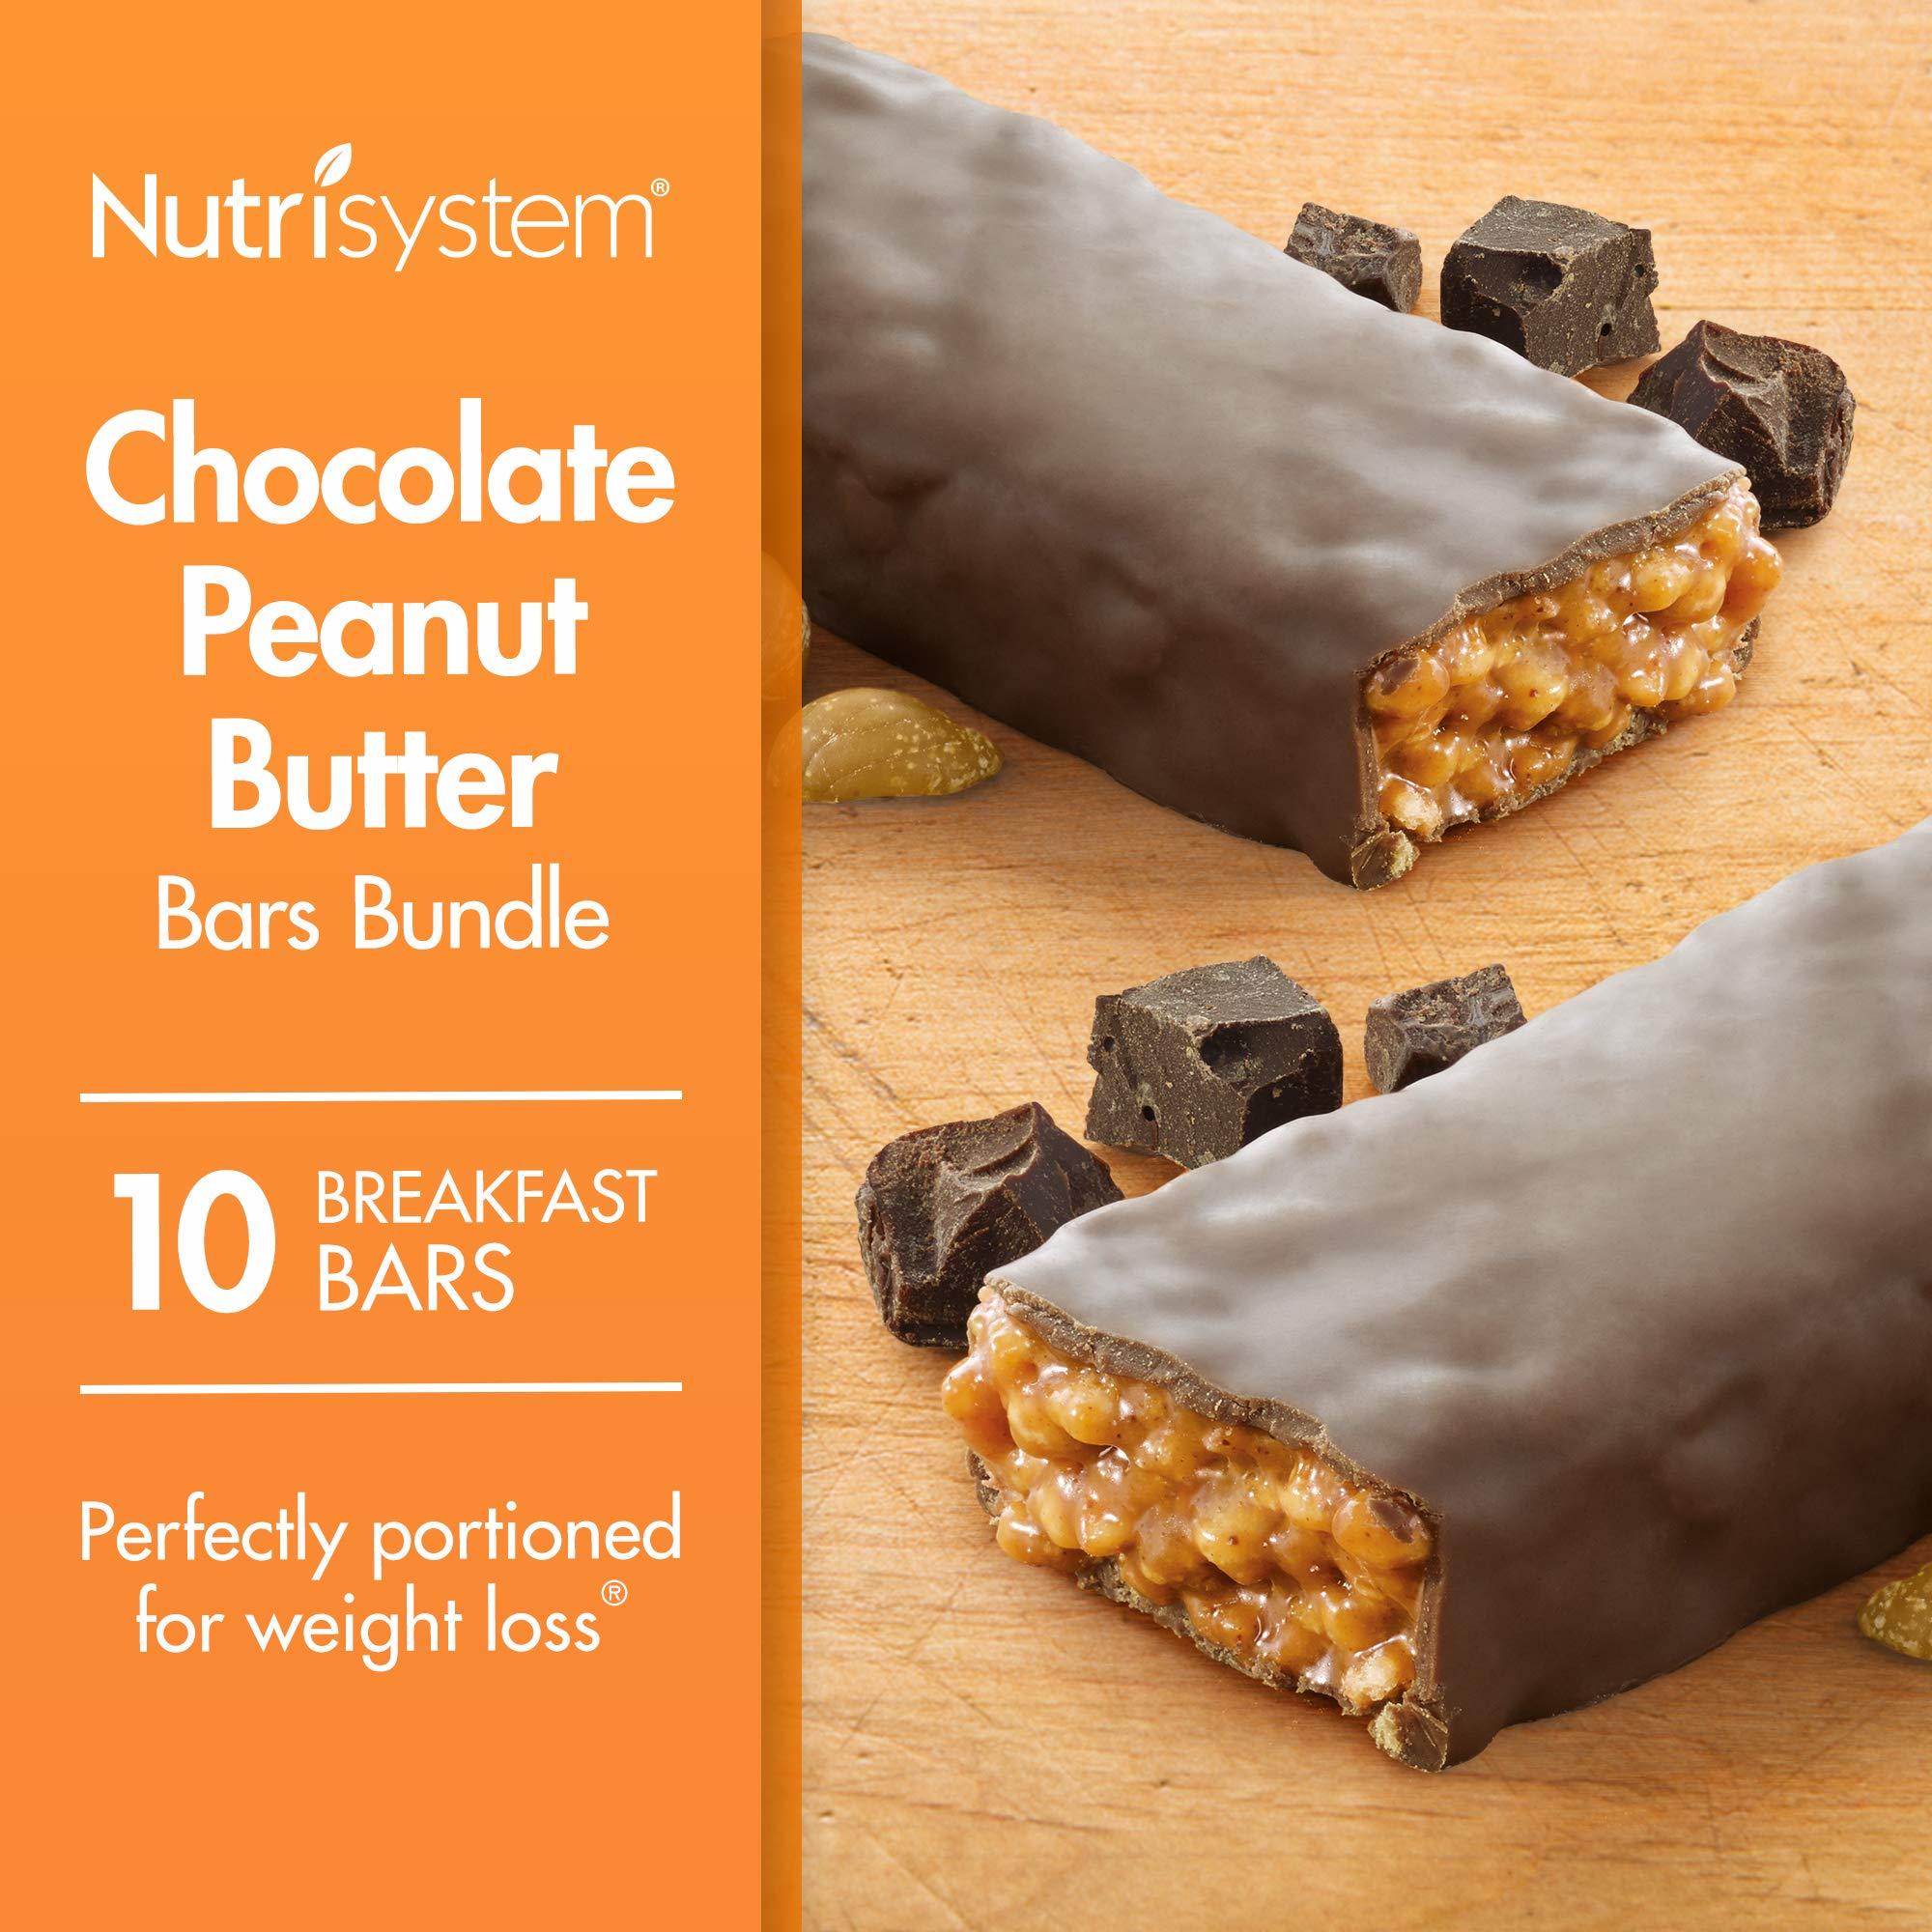 Nutrisystem® Chocolate Peanut Butter Bars Bundle, 10 Count Bars